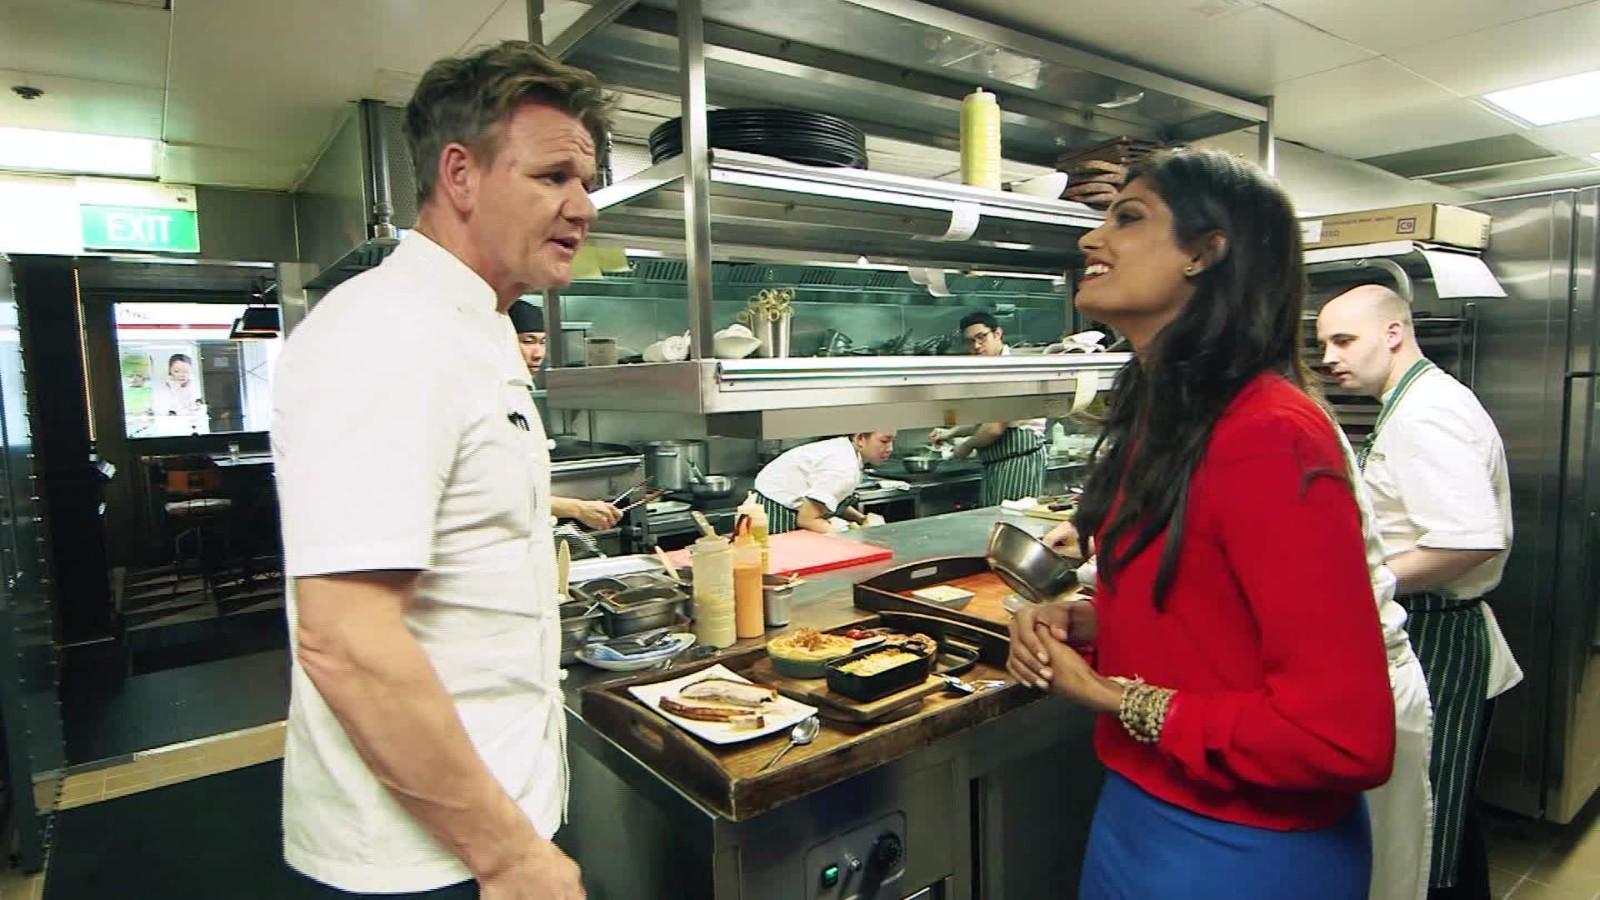 gordon ramsay loves singapore culture of great food cnn travel